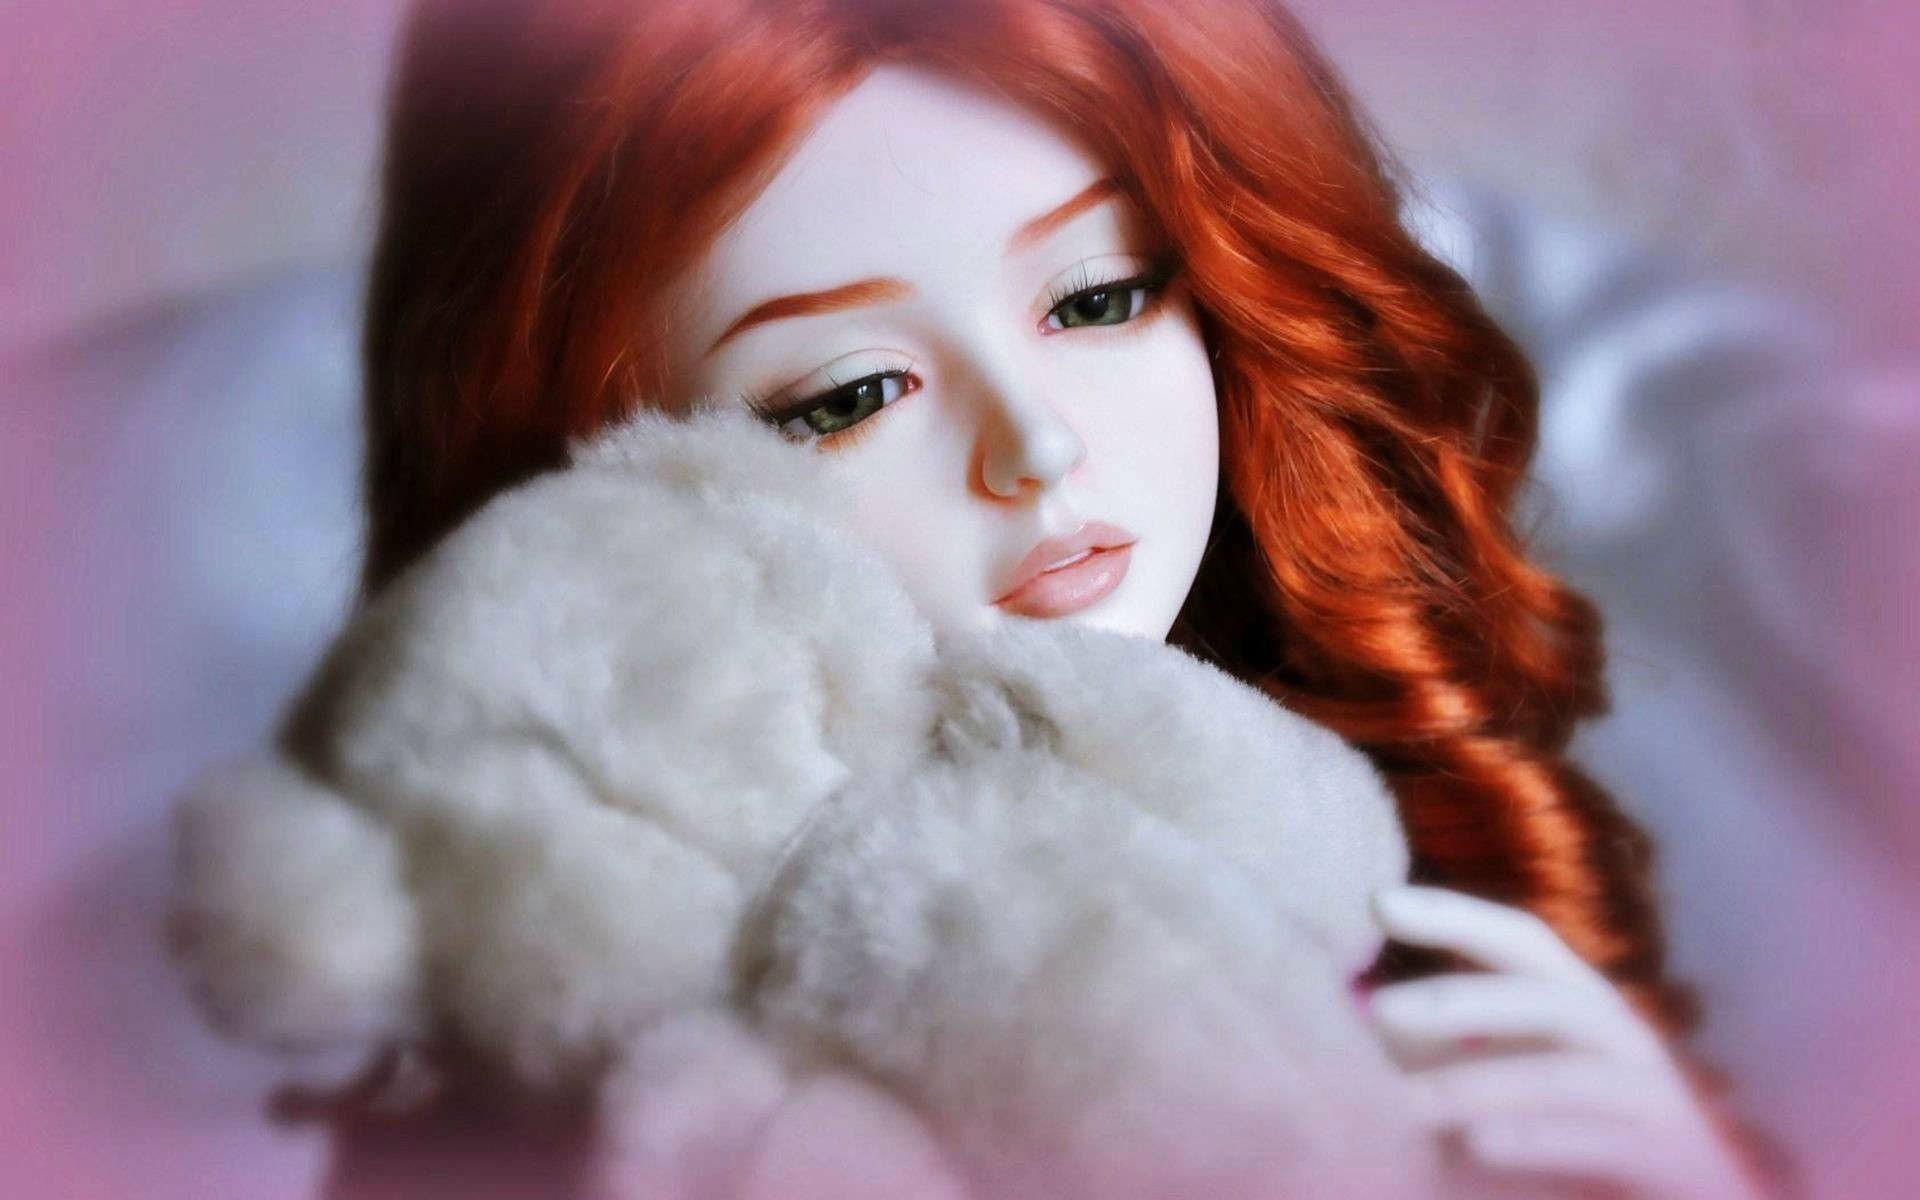 Cute Doll Wallpaper ①